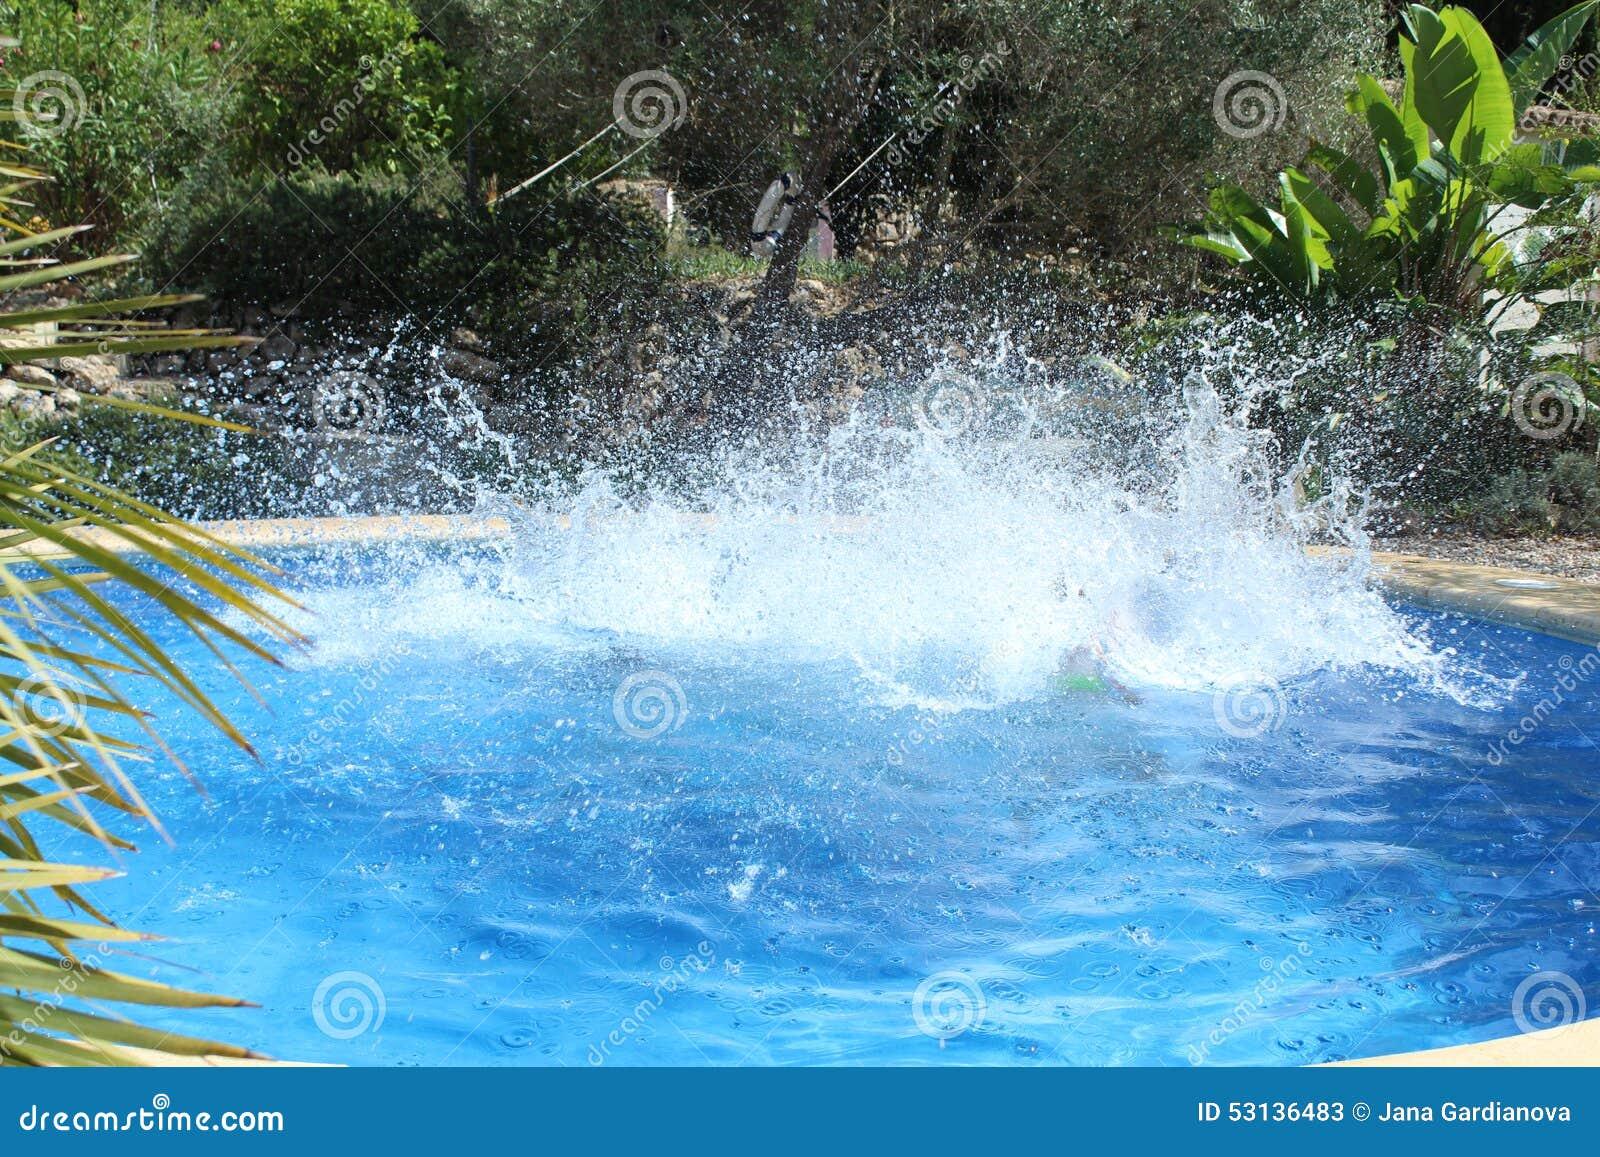 Pool Water Splash big water splash in the pool stock photo - image: 53136483